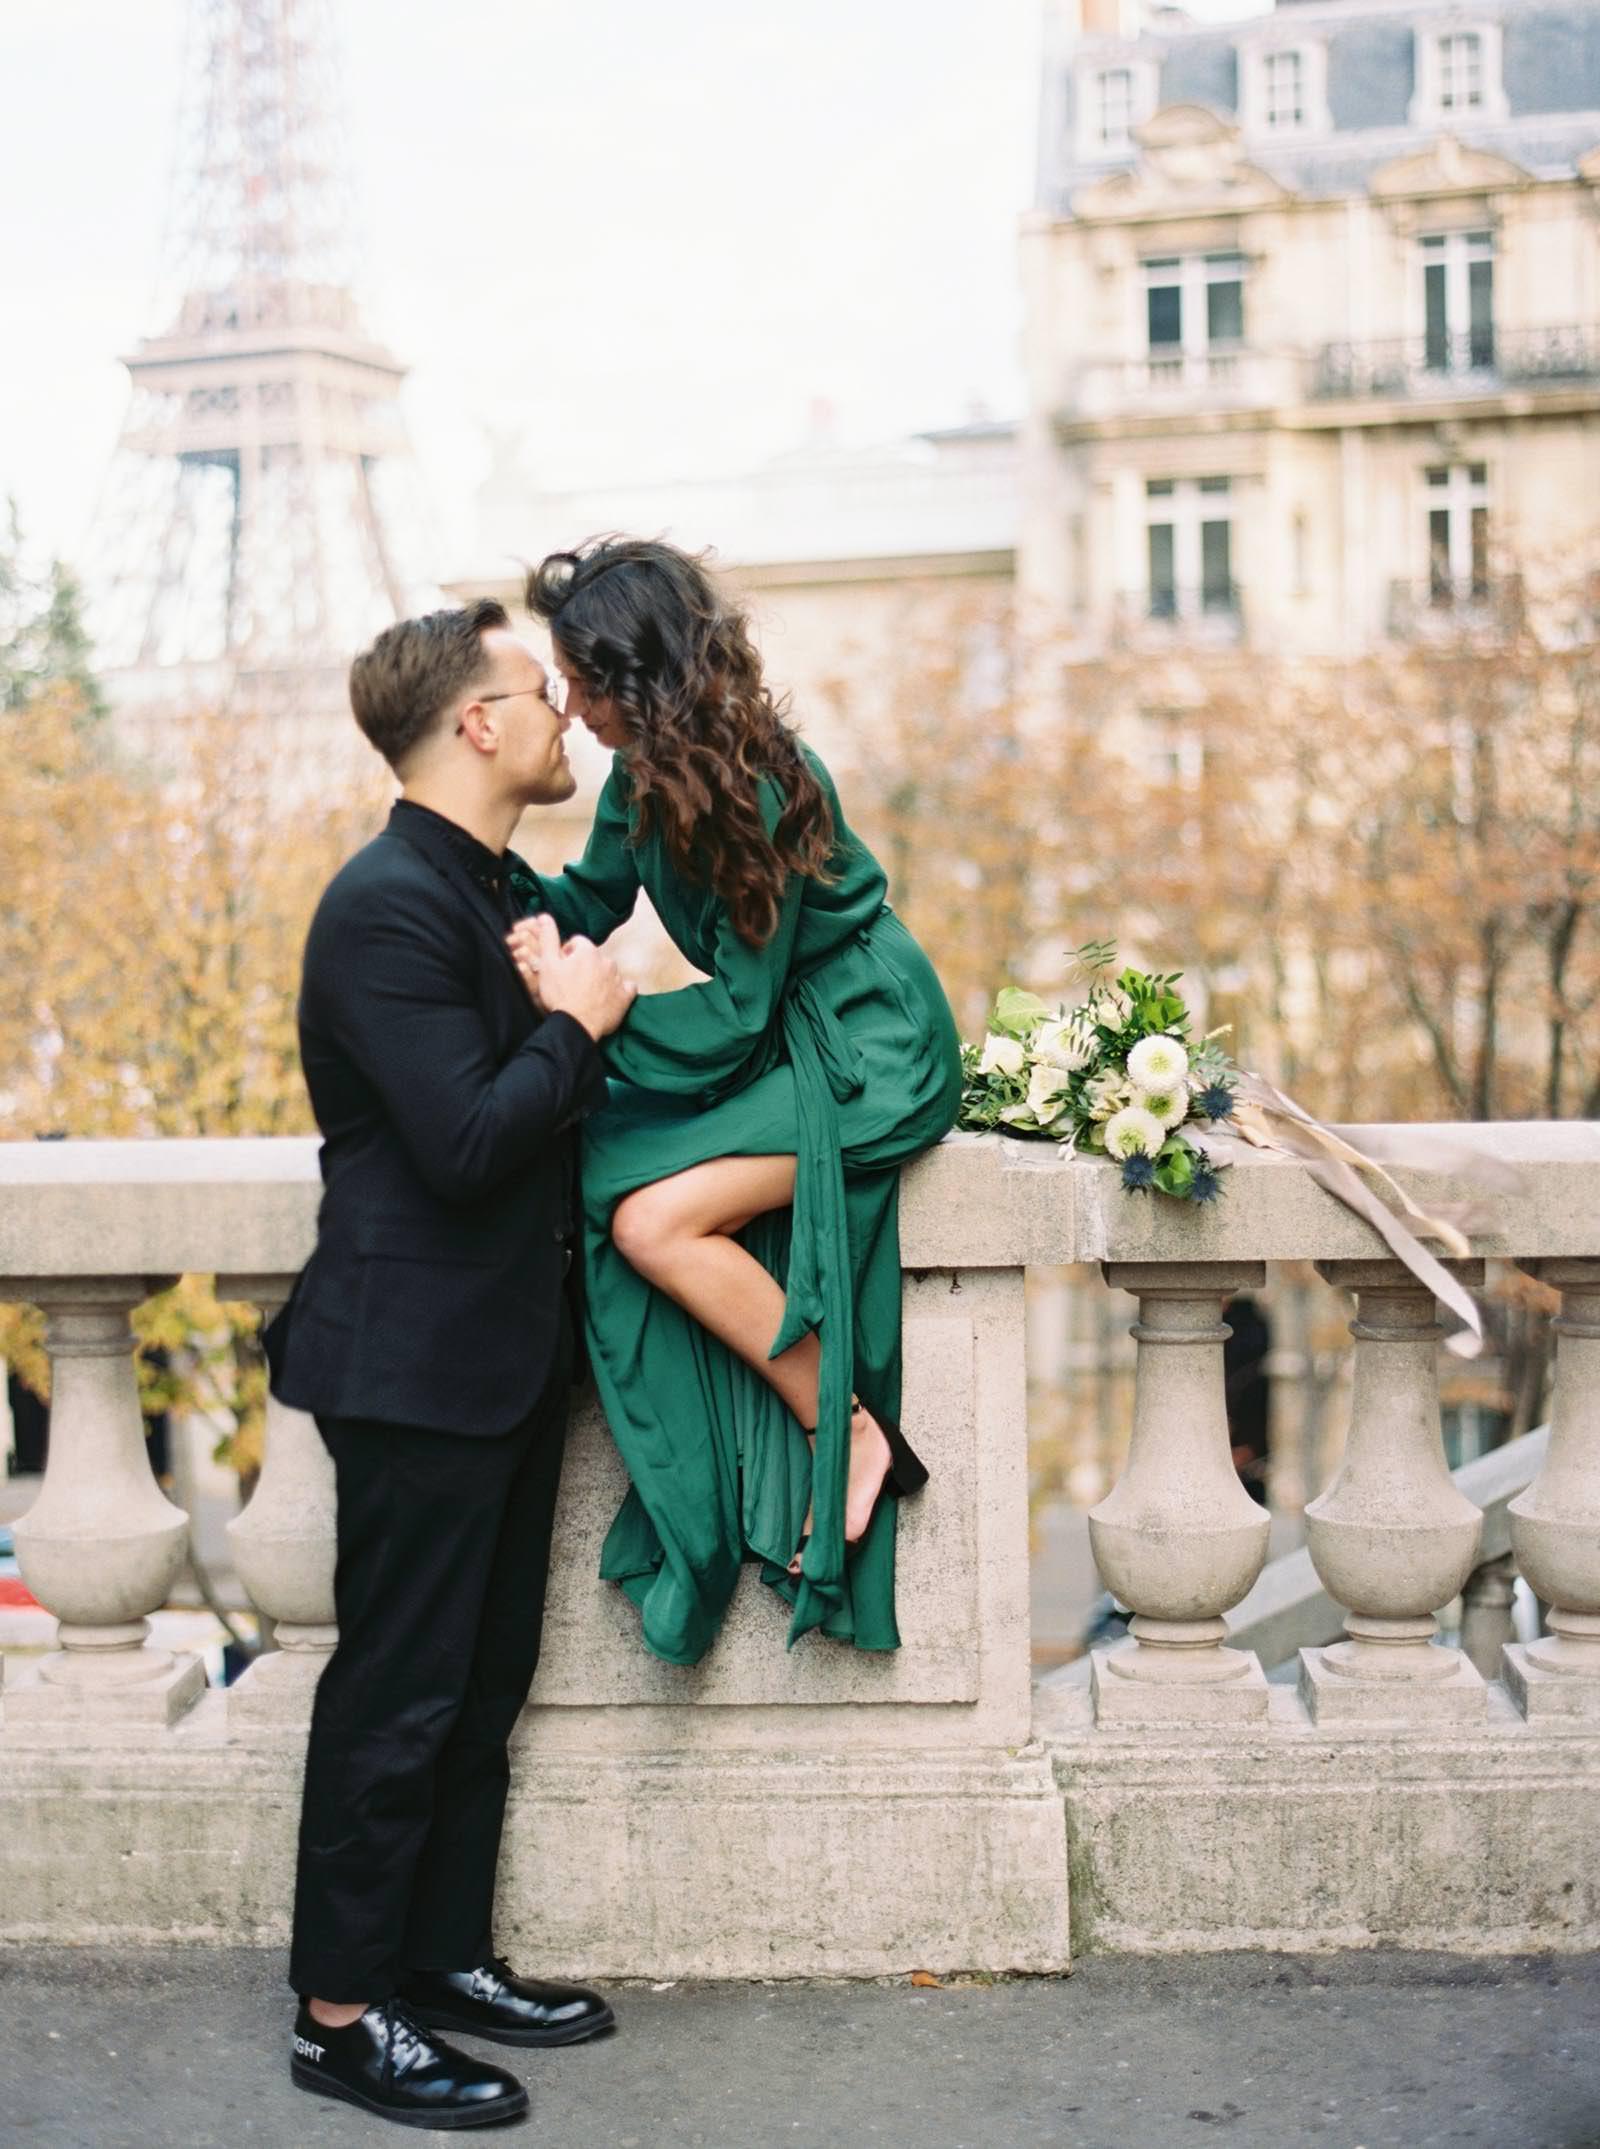 Paris engagement photos - film photography - KR Moreno Photo